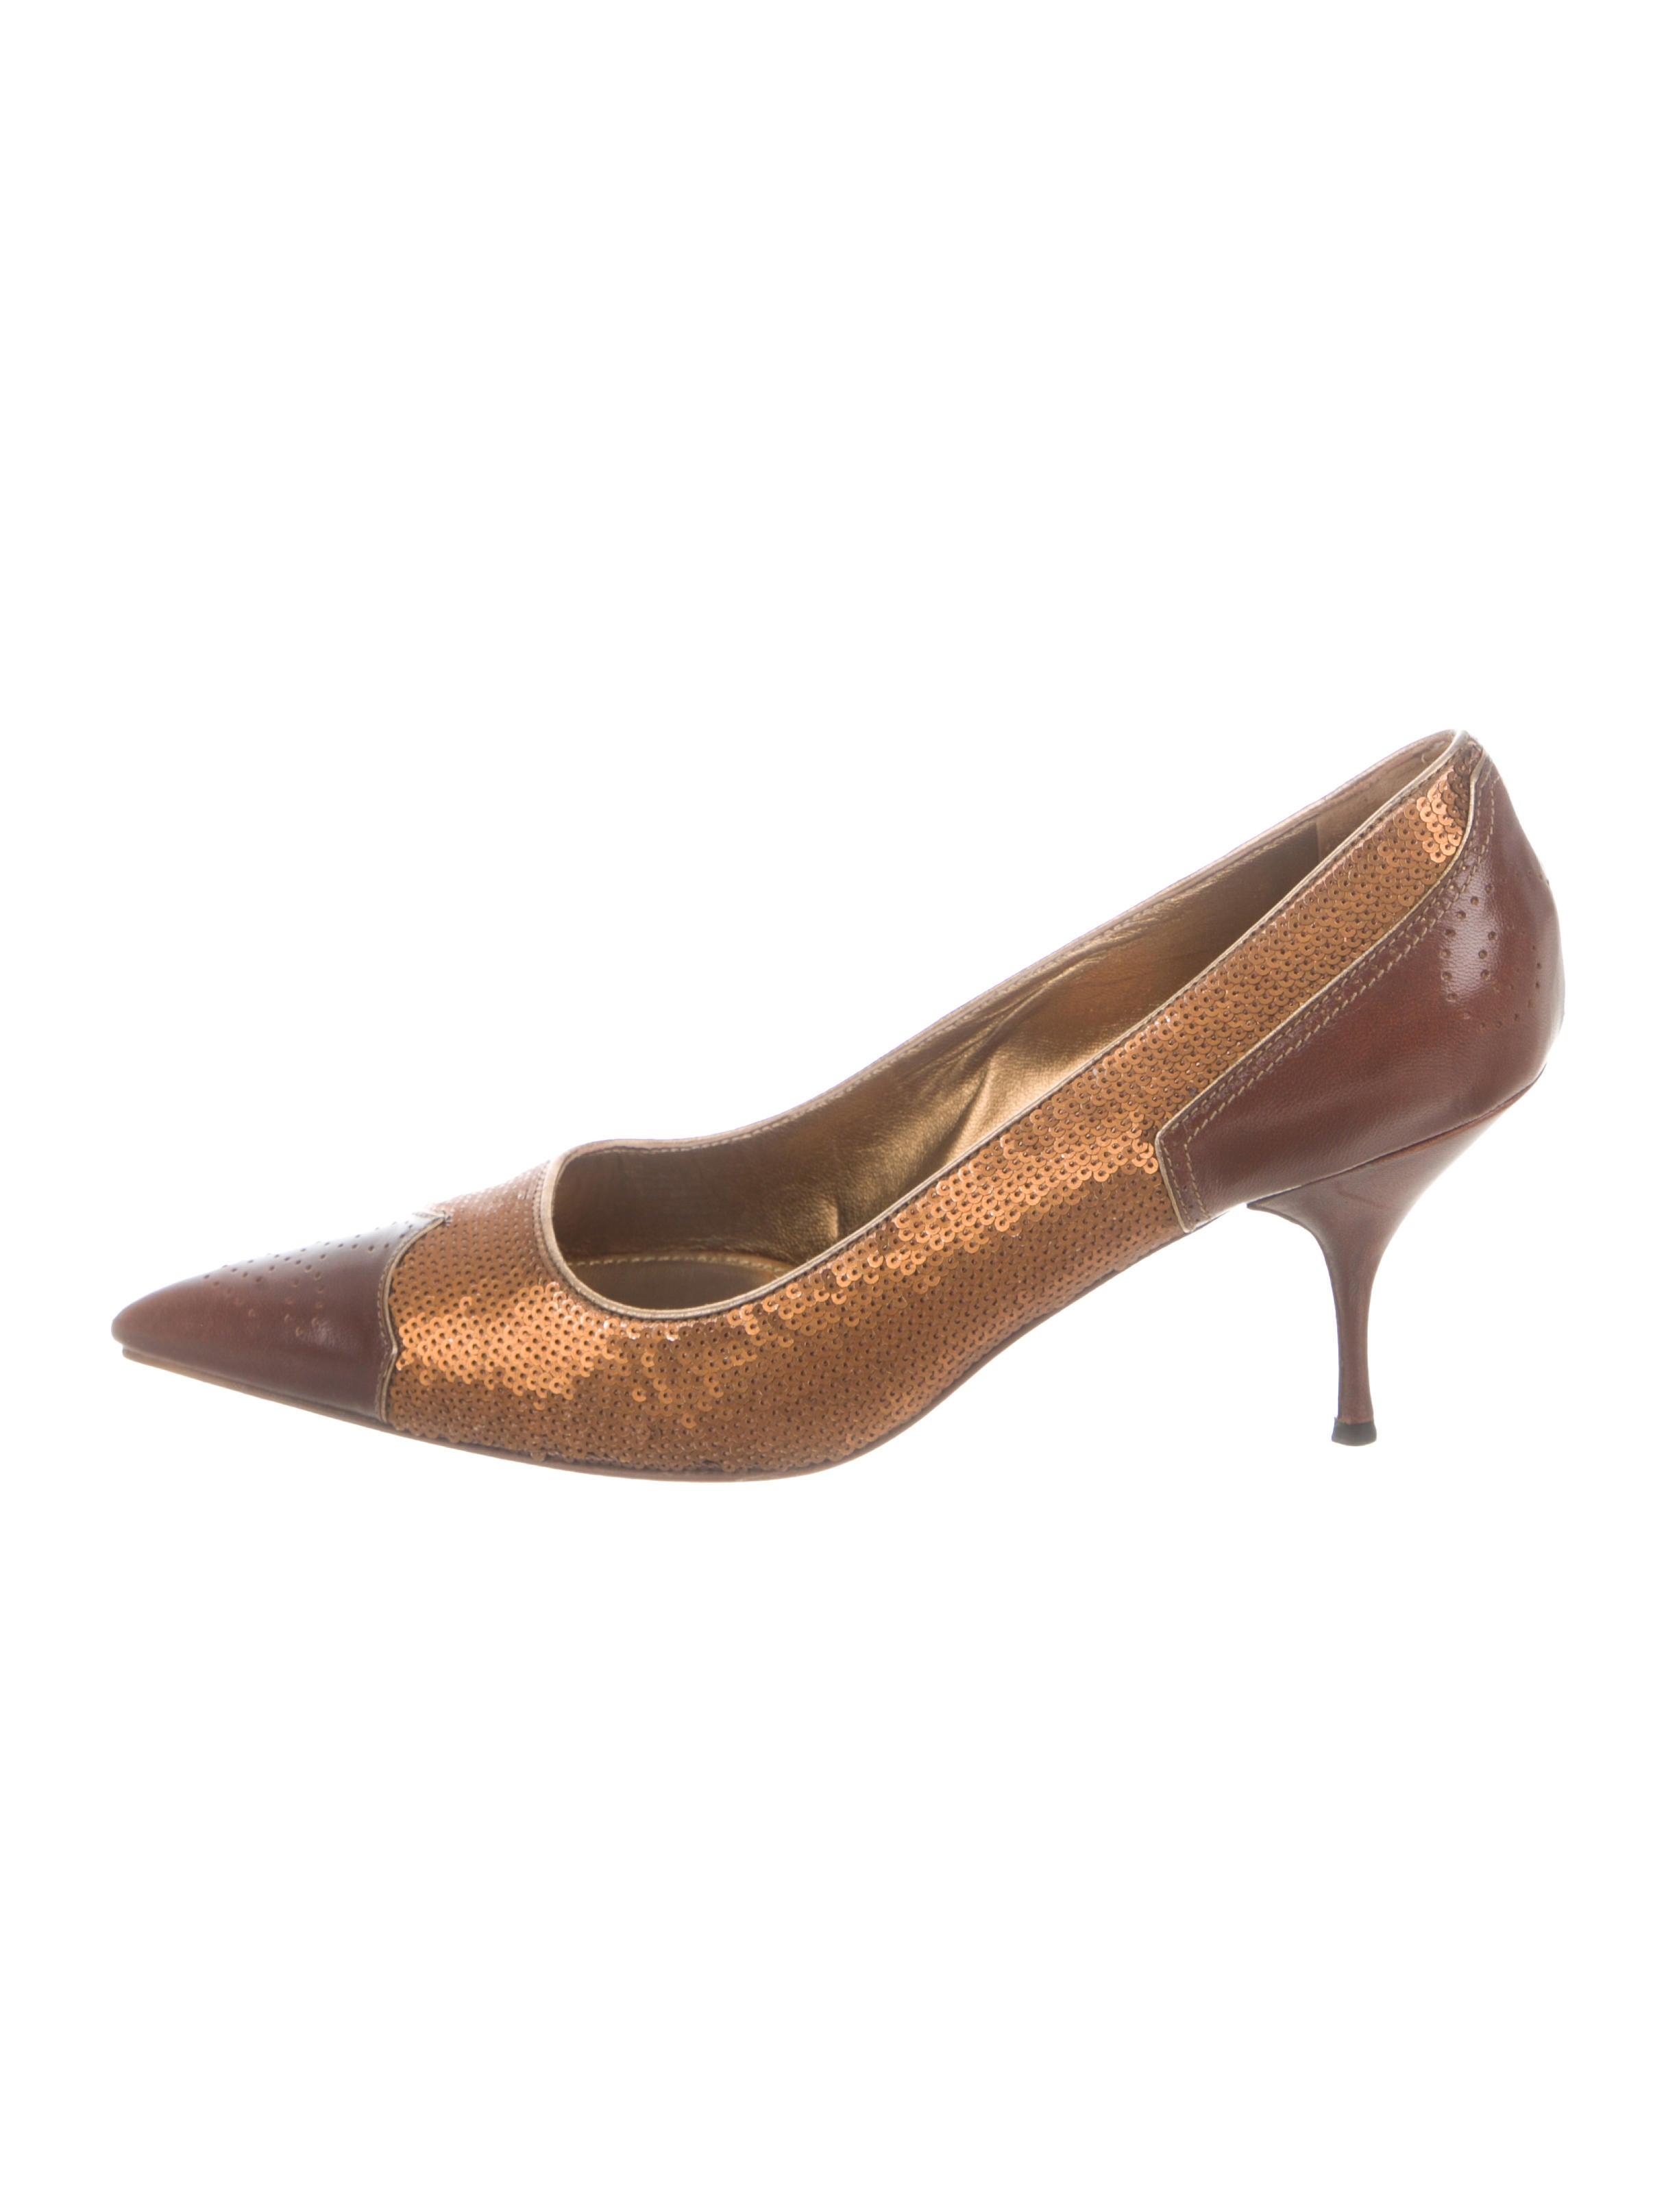 a2d03d46bdaf Prada Sequin Pointed-Toe Pumps - Shoes - PRA273326